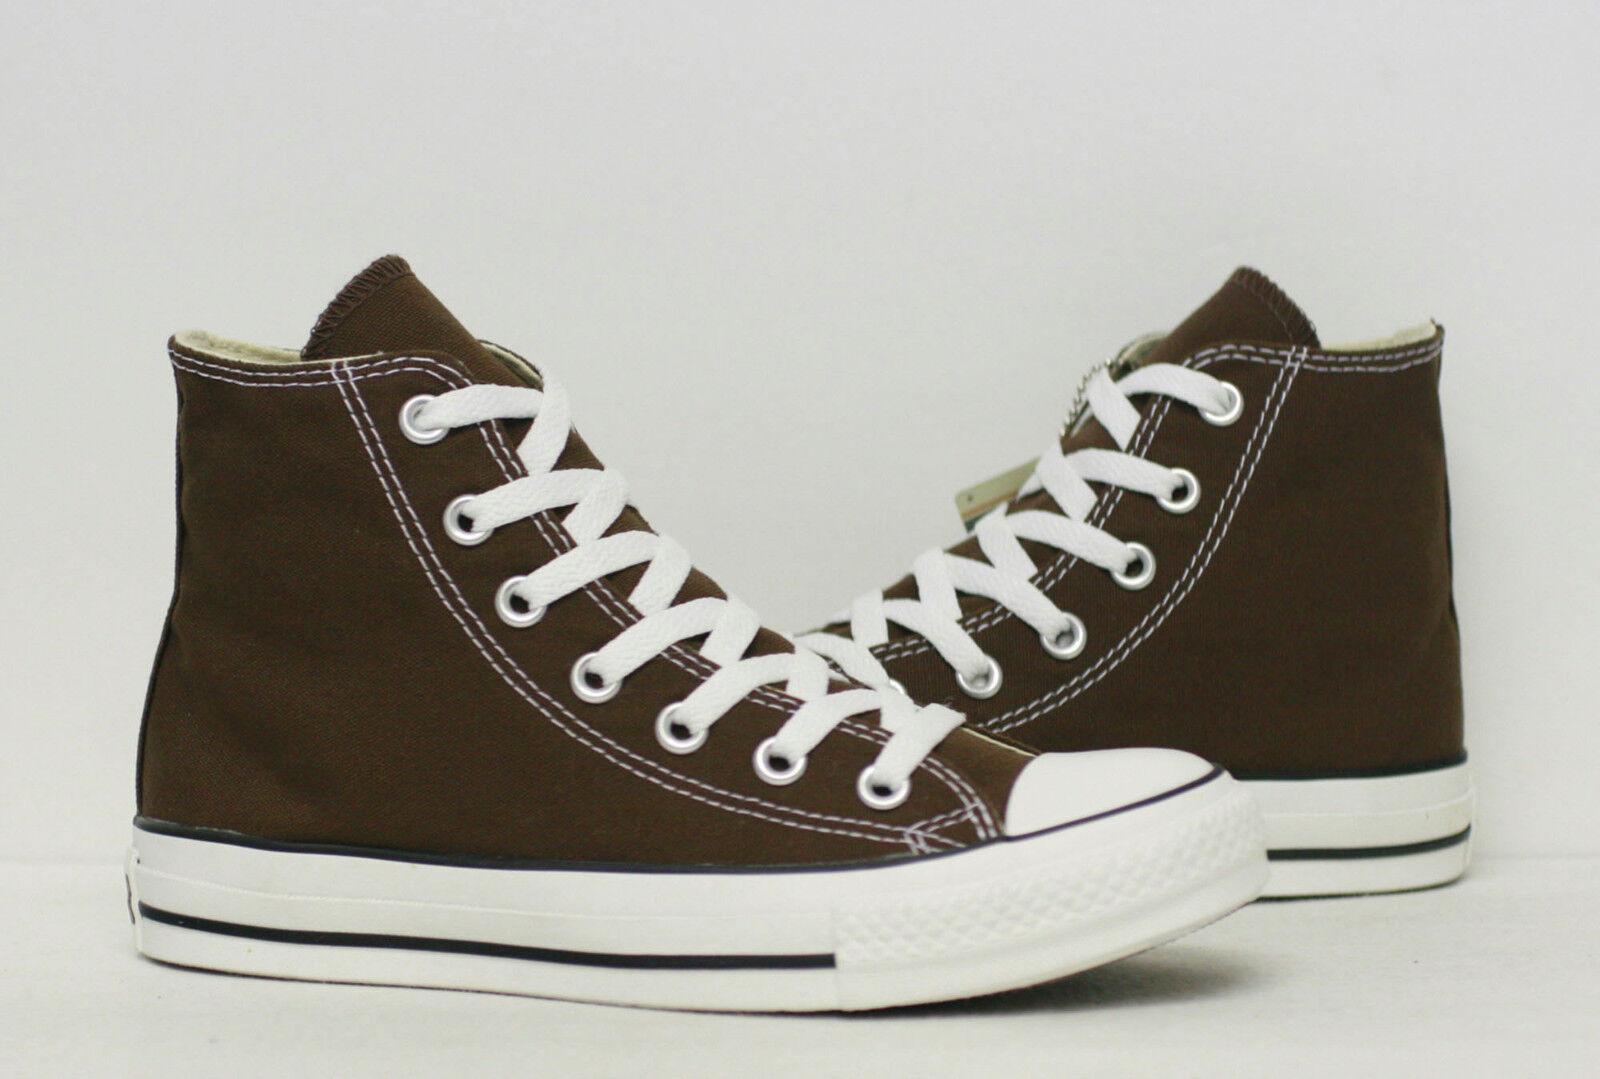 Converse All Star Chuck Taylor Chocolate Hi Shoes 1P626 Mens 3~12 Womens 5~14